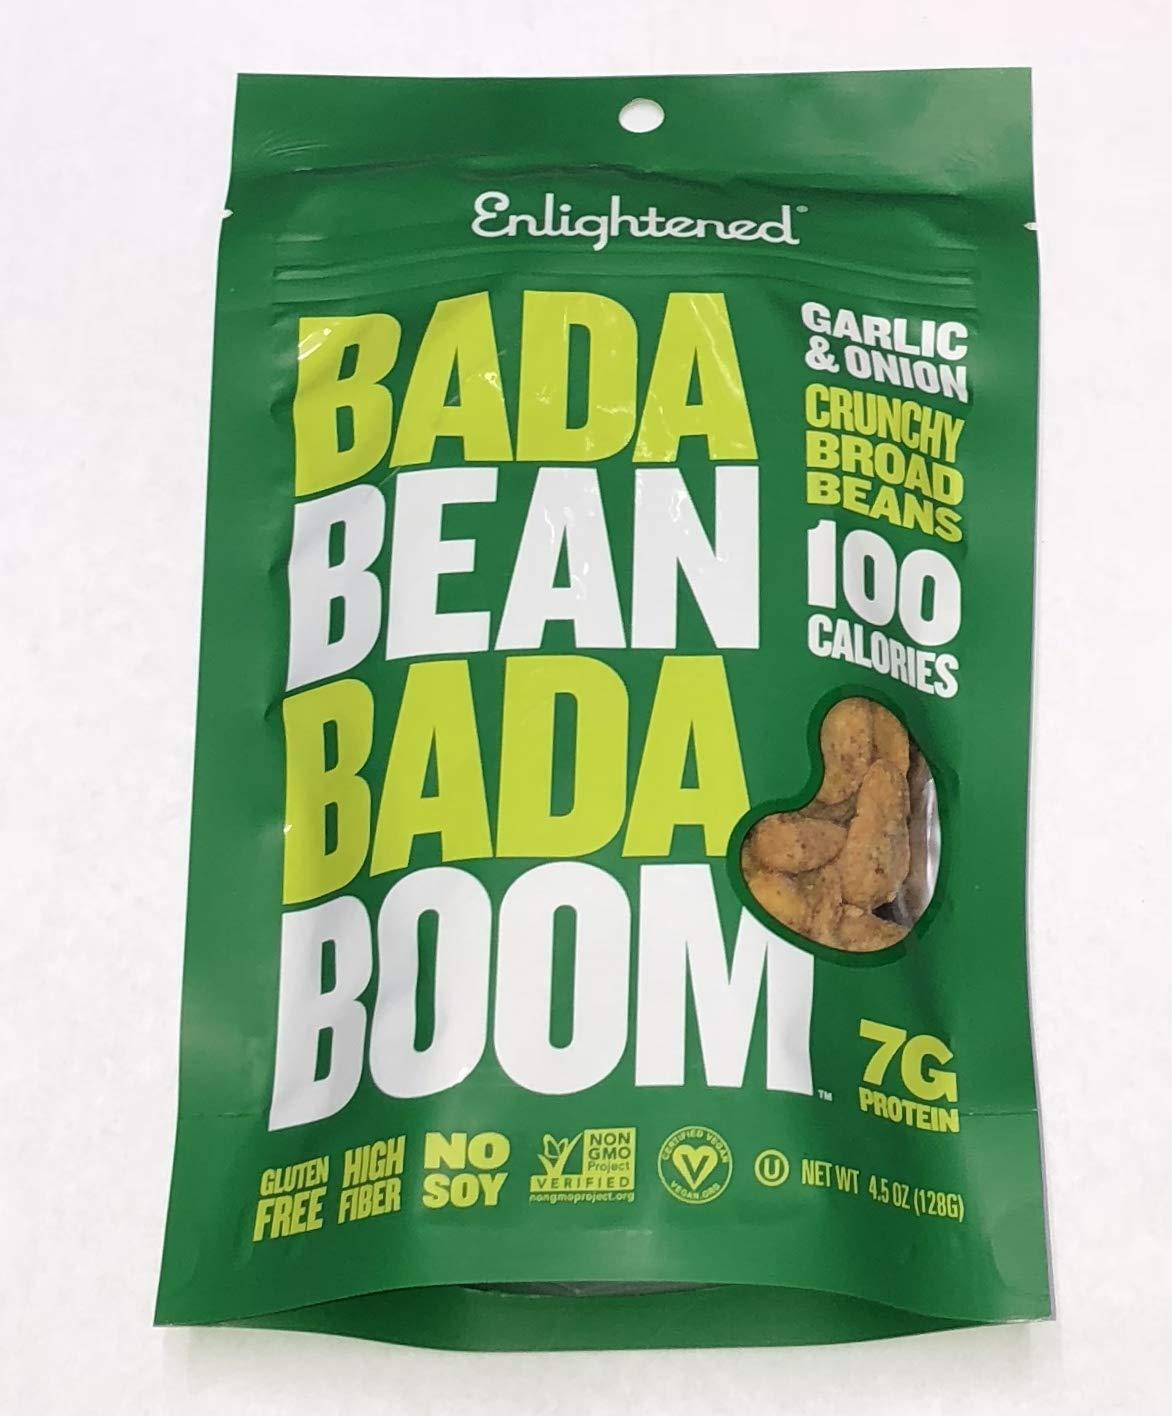 ENLIGHTENED BROAD BEAN (FAVA BEANS) CRISPS 6-4.5 oz BAGS (GARLIC & ONION)